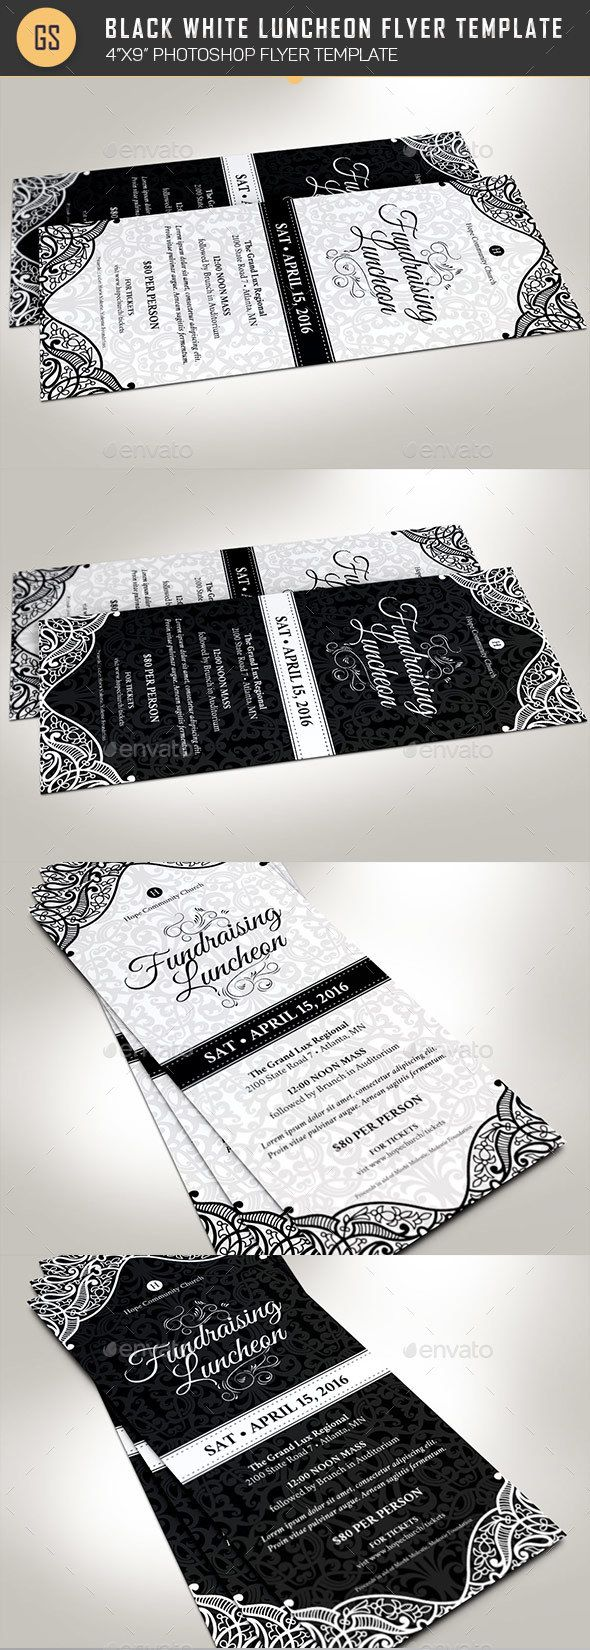 Black White Luncheon Flyer Template Pinterest Flyer Template